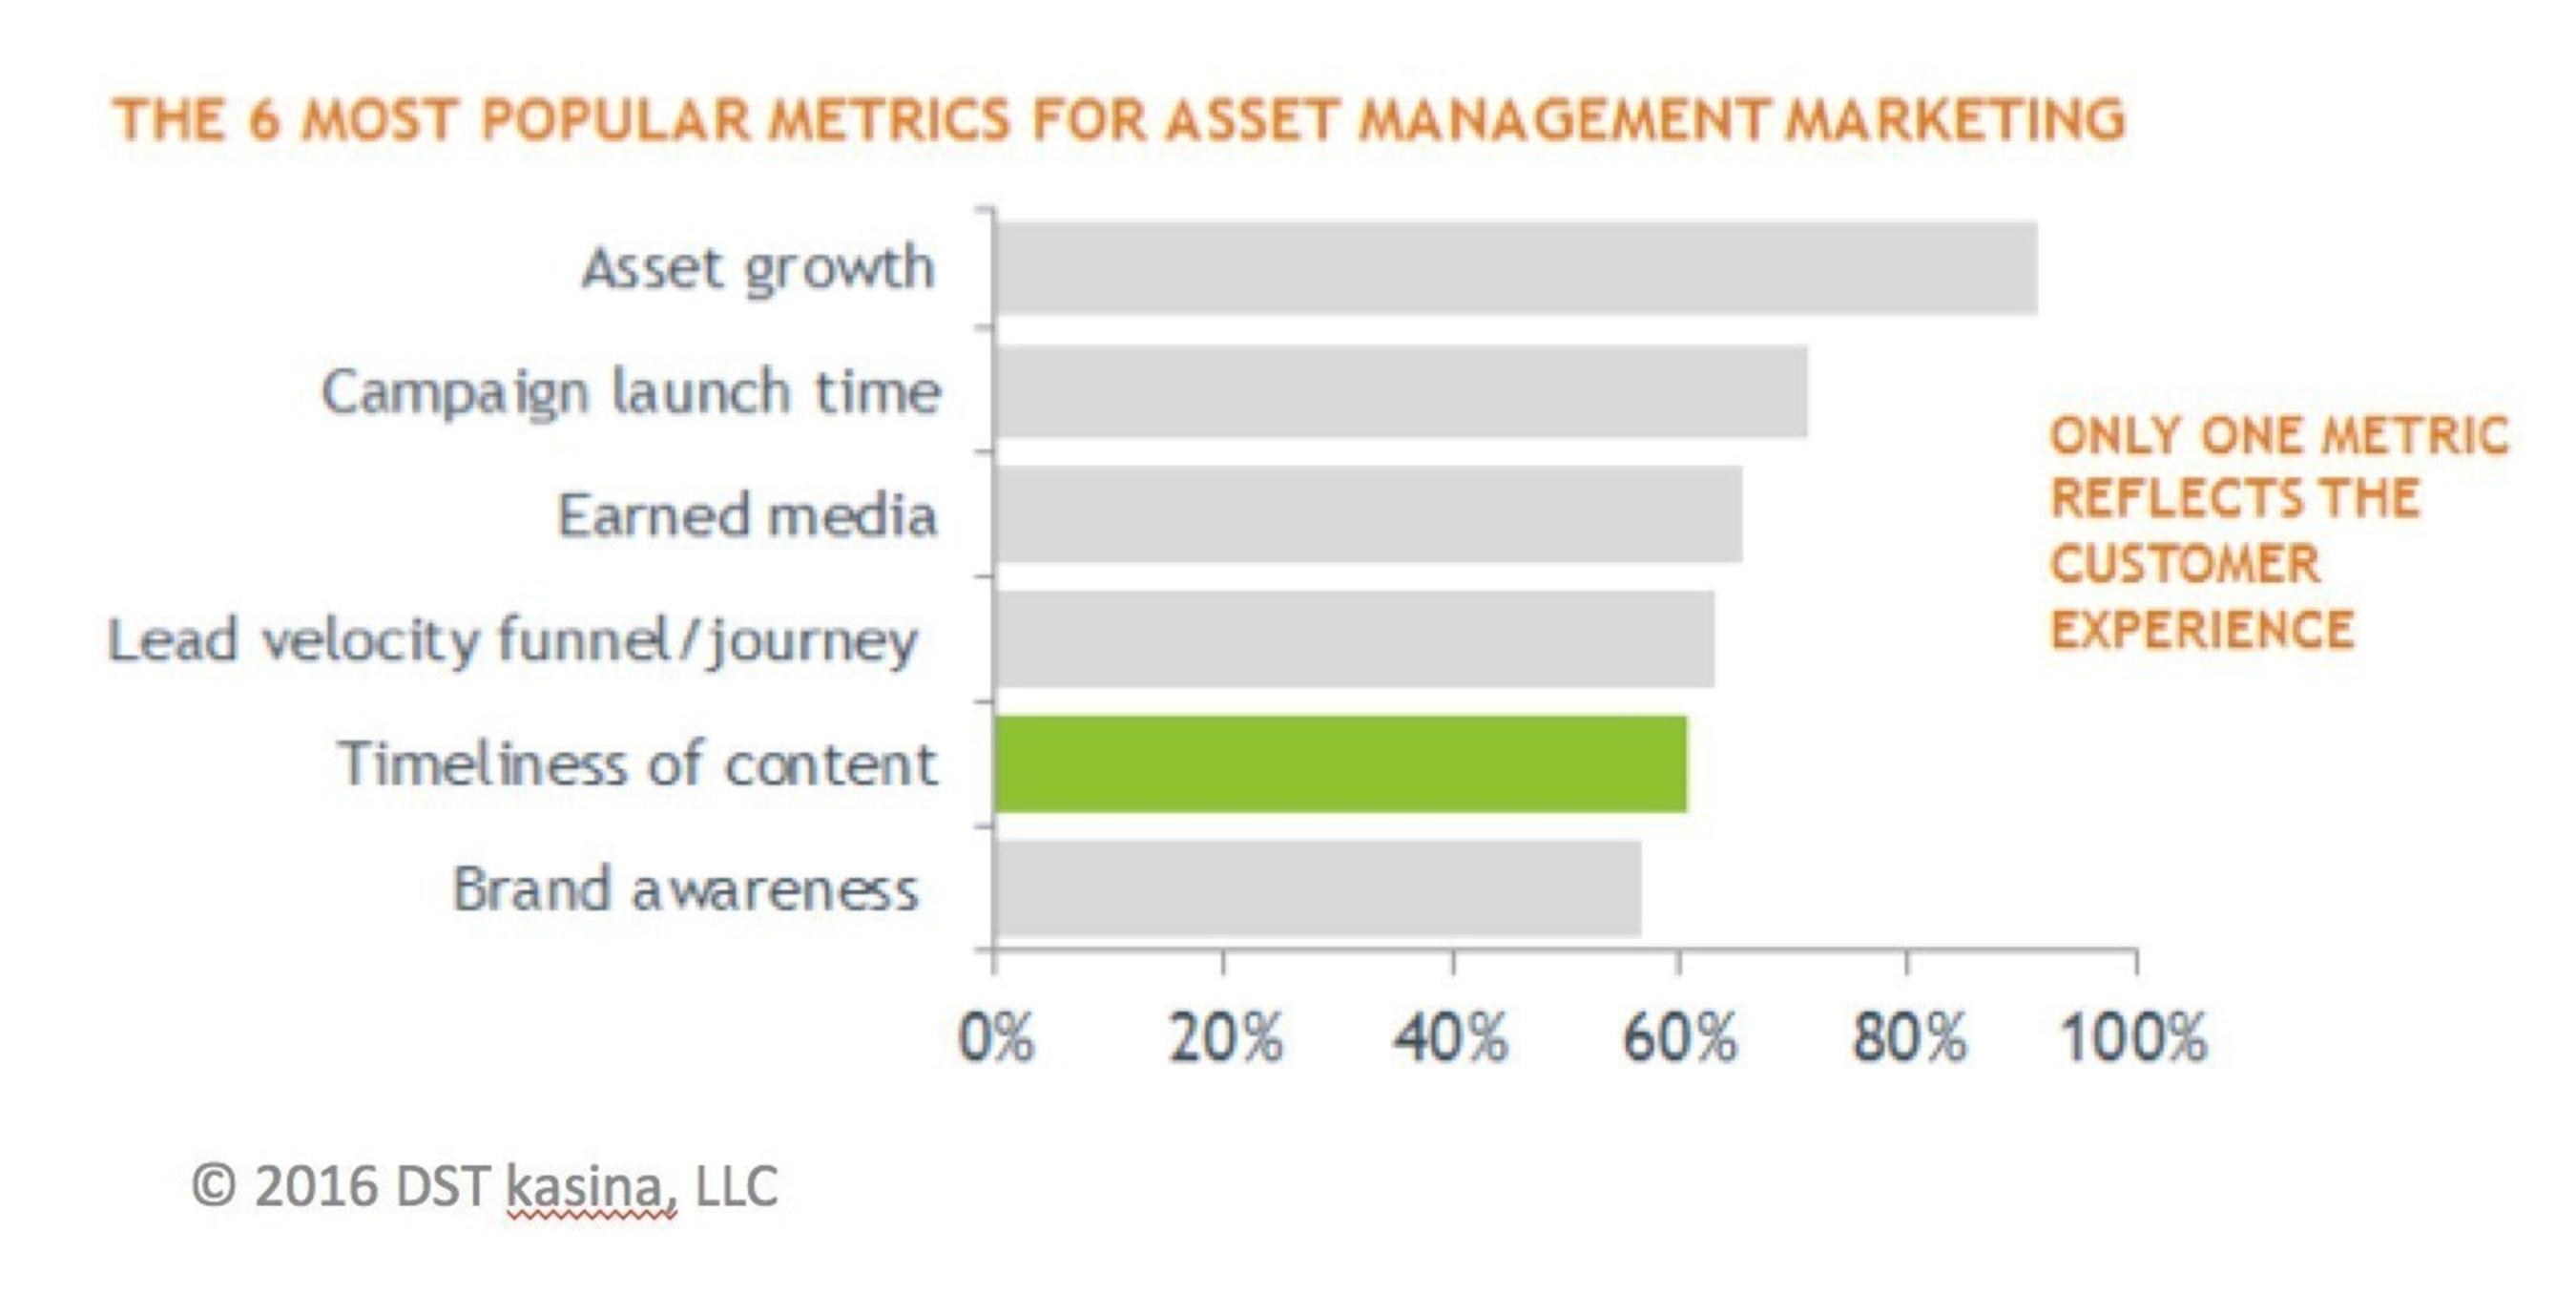 The 6 Most Popular Metrics For Asset Management Marketing